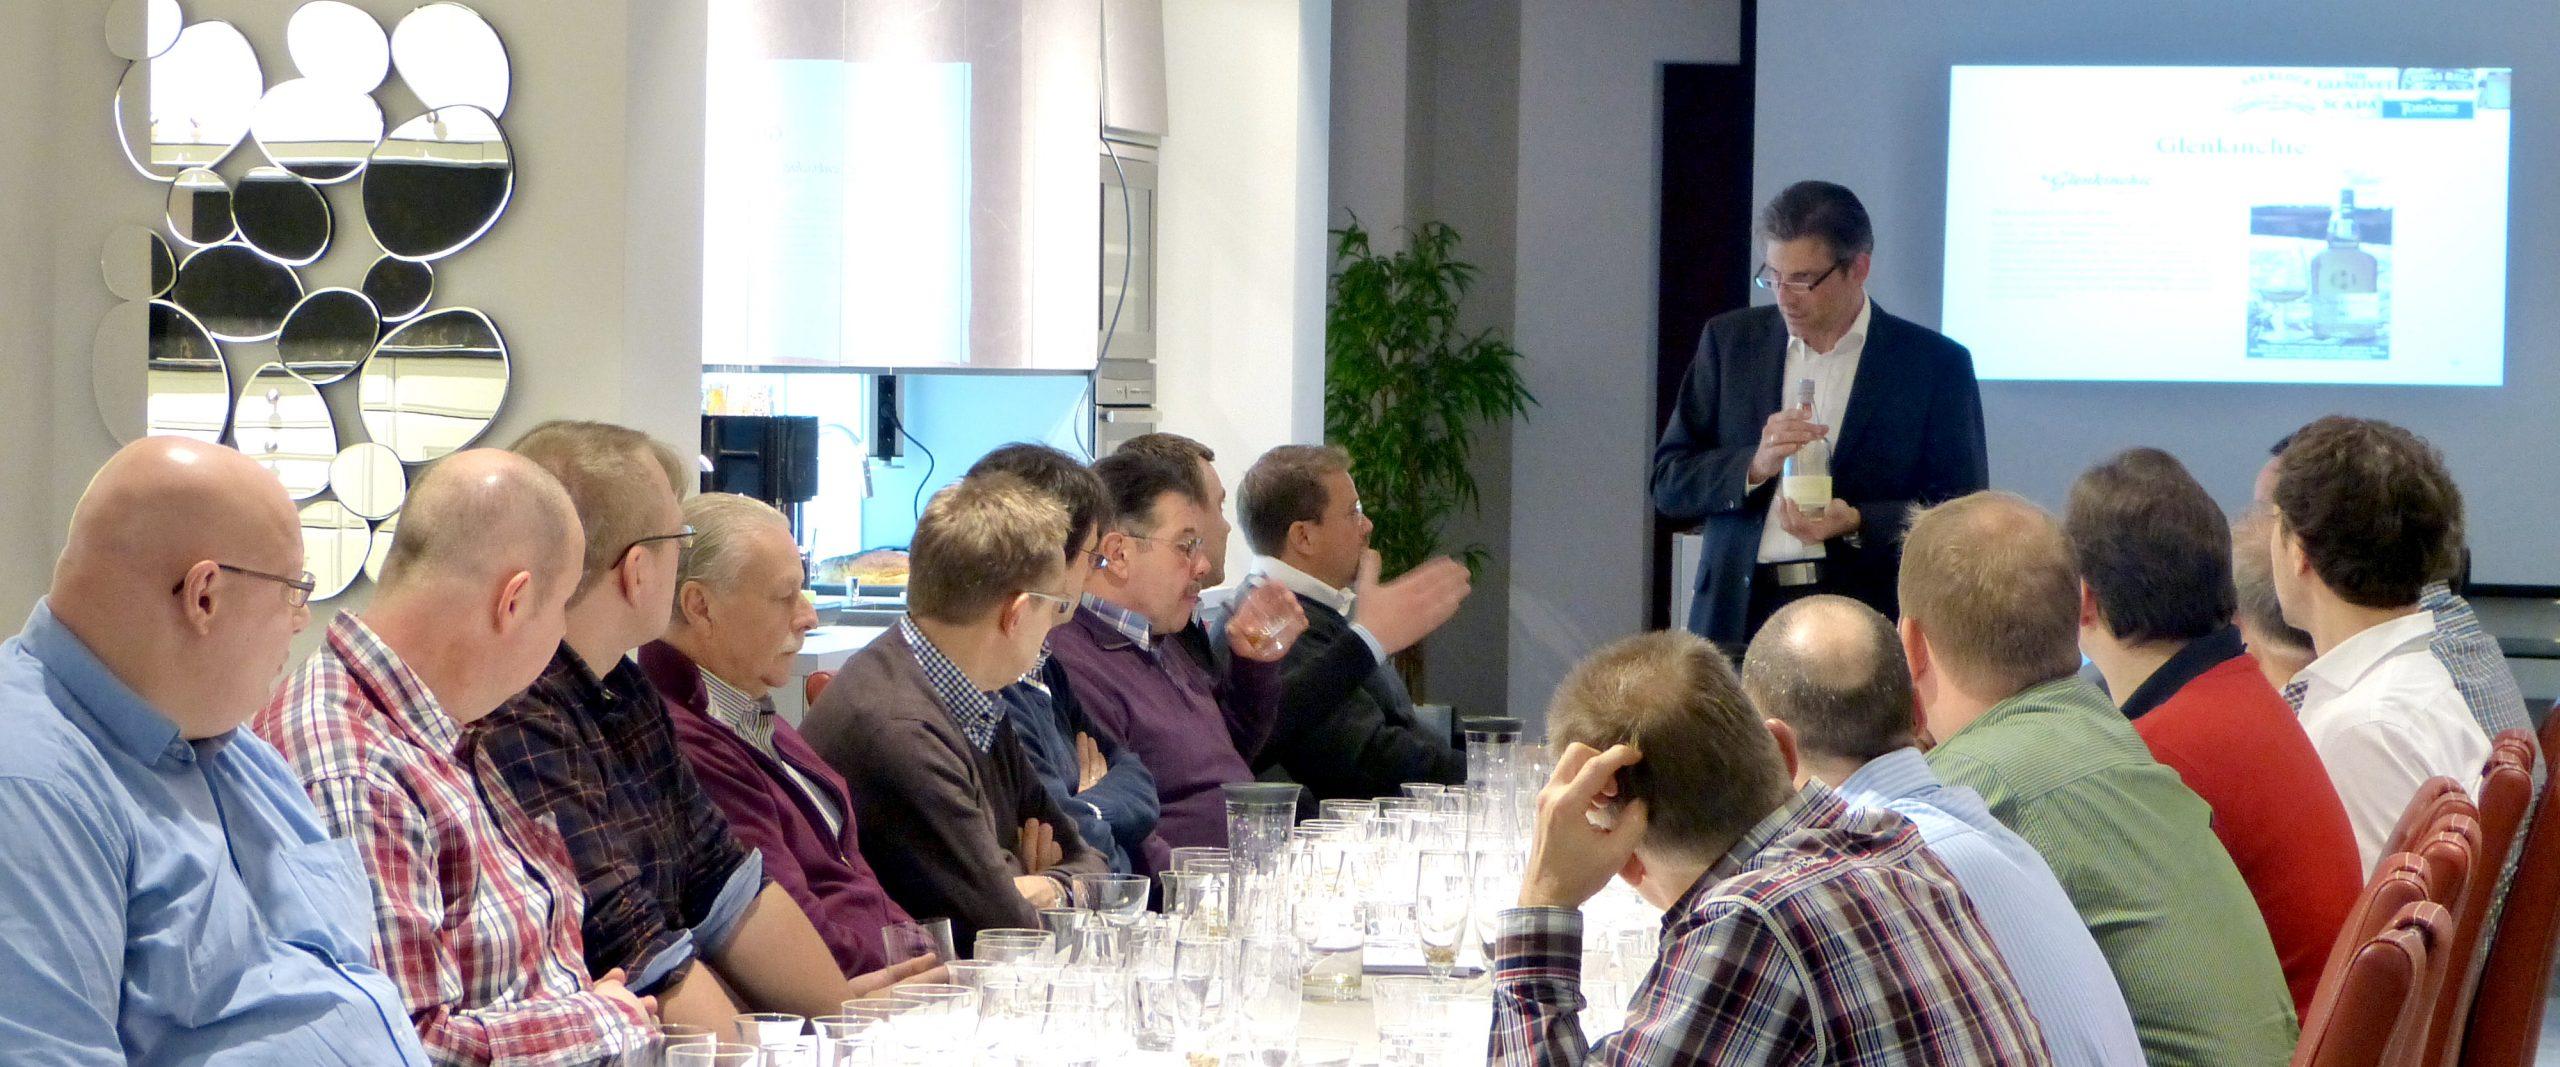 FUW-WeinkennerDiplom IHK-zertifiziert - Seminar